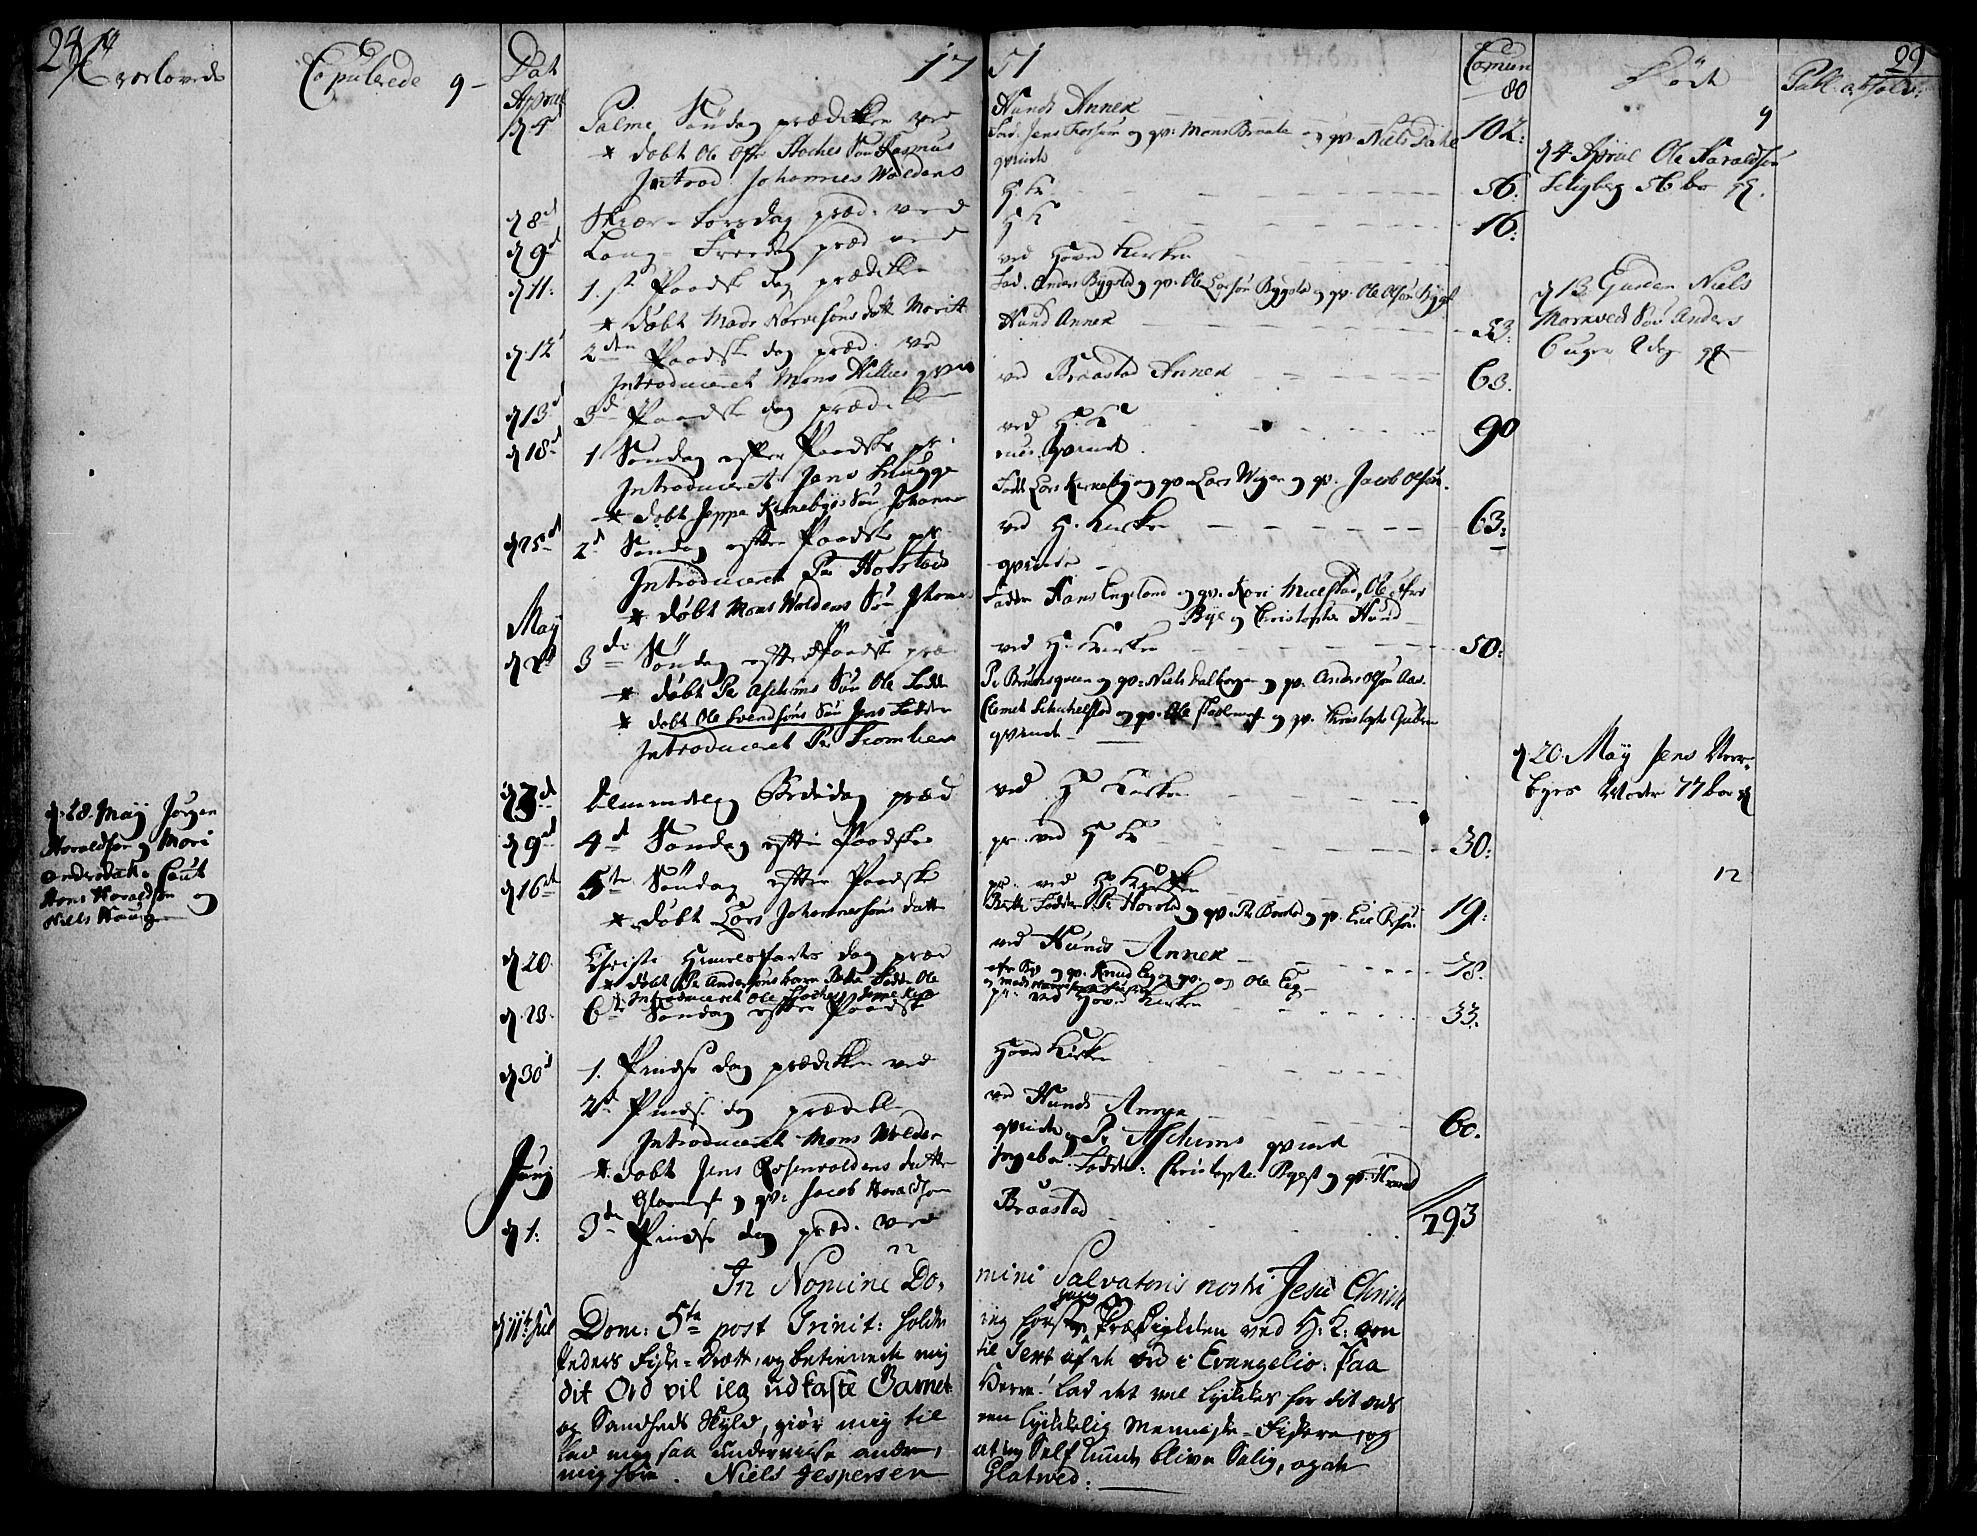 SAH, Vardal prestekontor, H/Ha/Haa/L0002: Ministerialbok nr. 2, 1748-1776, s. 28-29